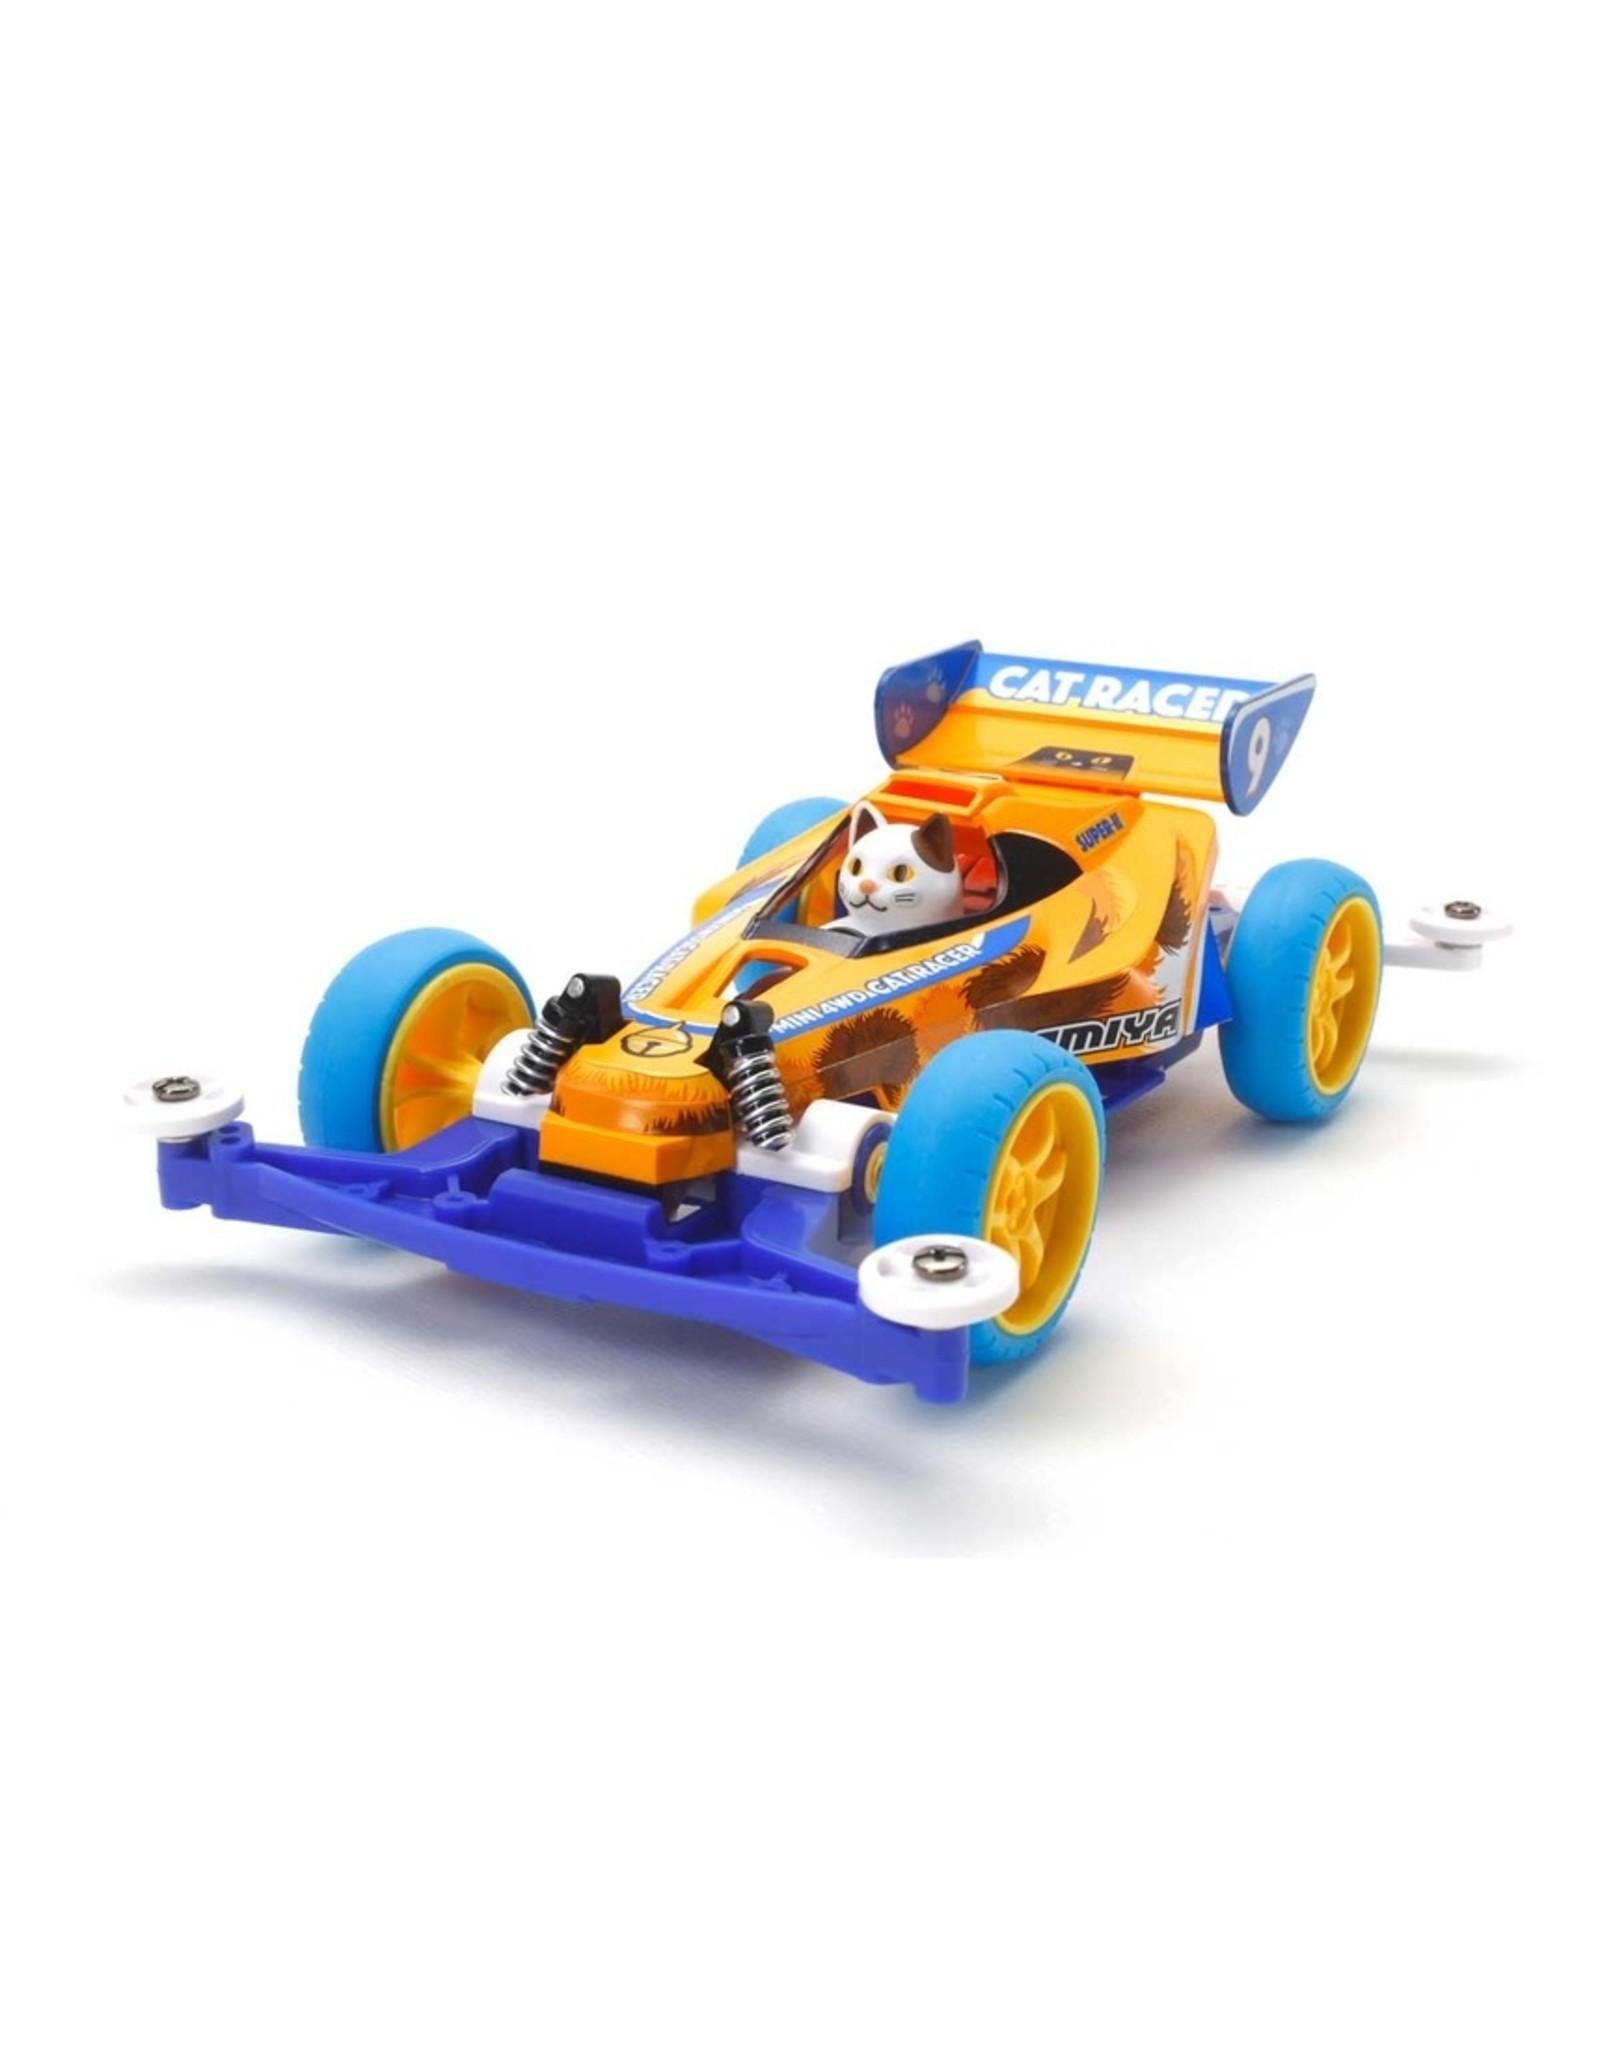 Tamiya JR Cat Racer - Super II Chassis - FULLY-BUILT